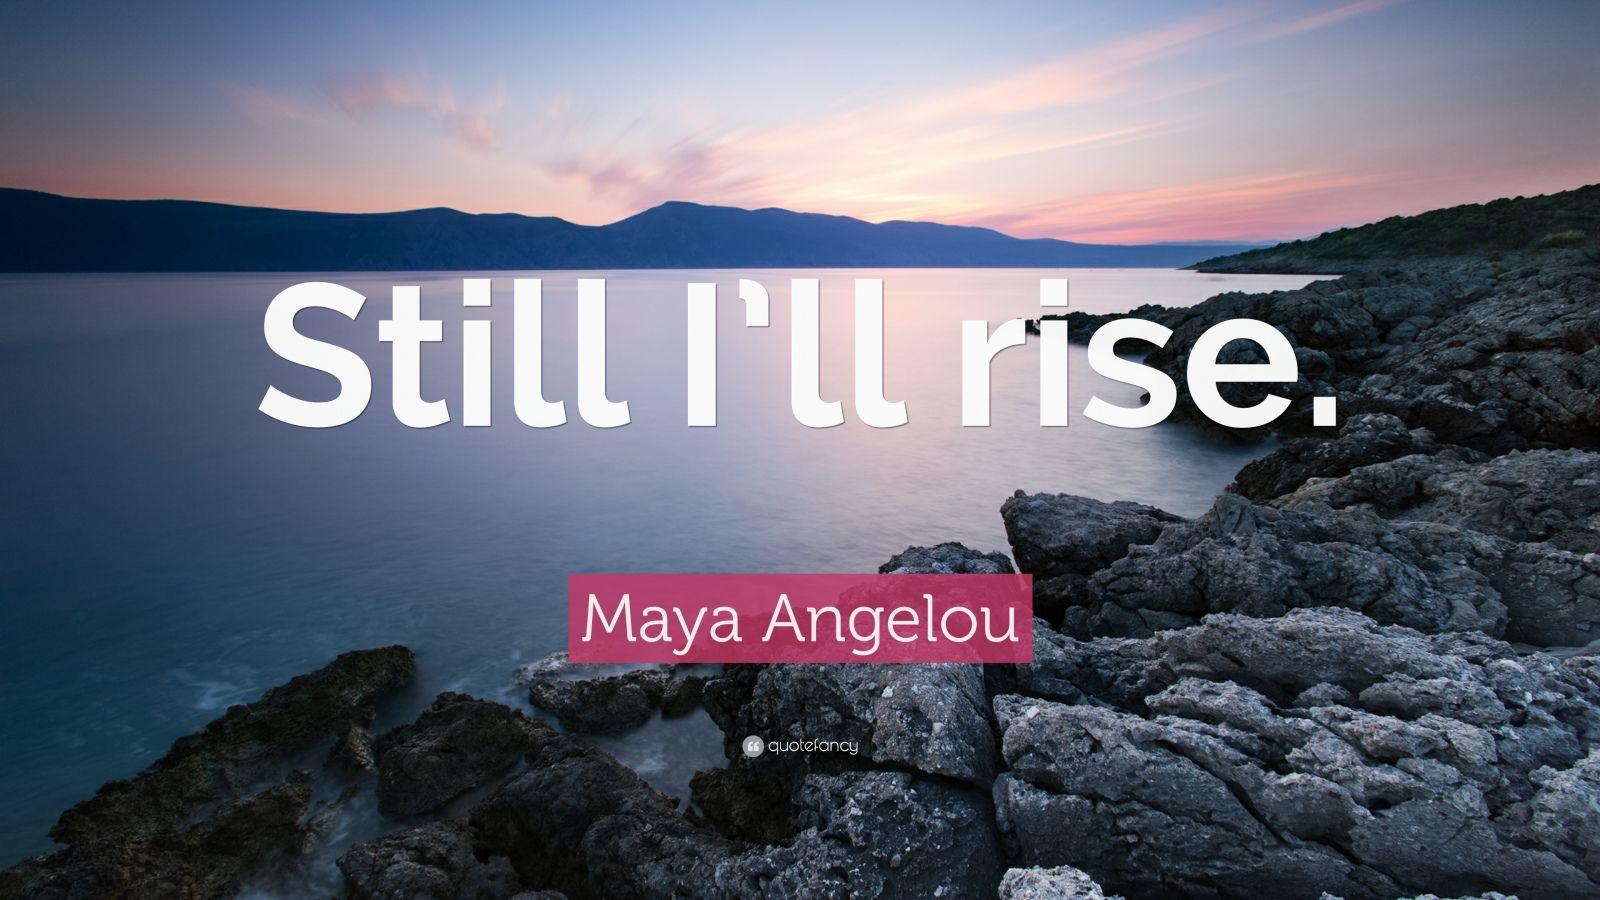 Success Quotes Desktop Wallpaper Maya Angelou Quote Still I Ll Rise 12 Wallpapers